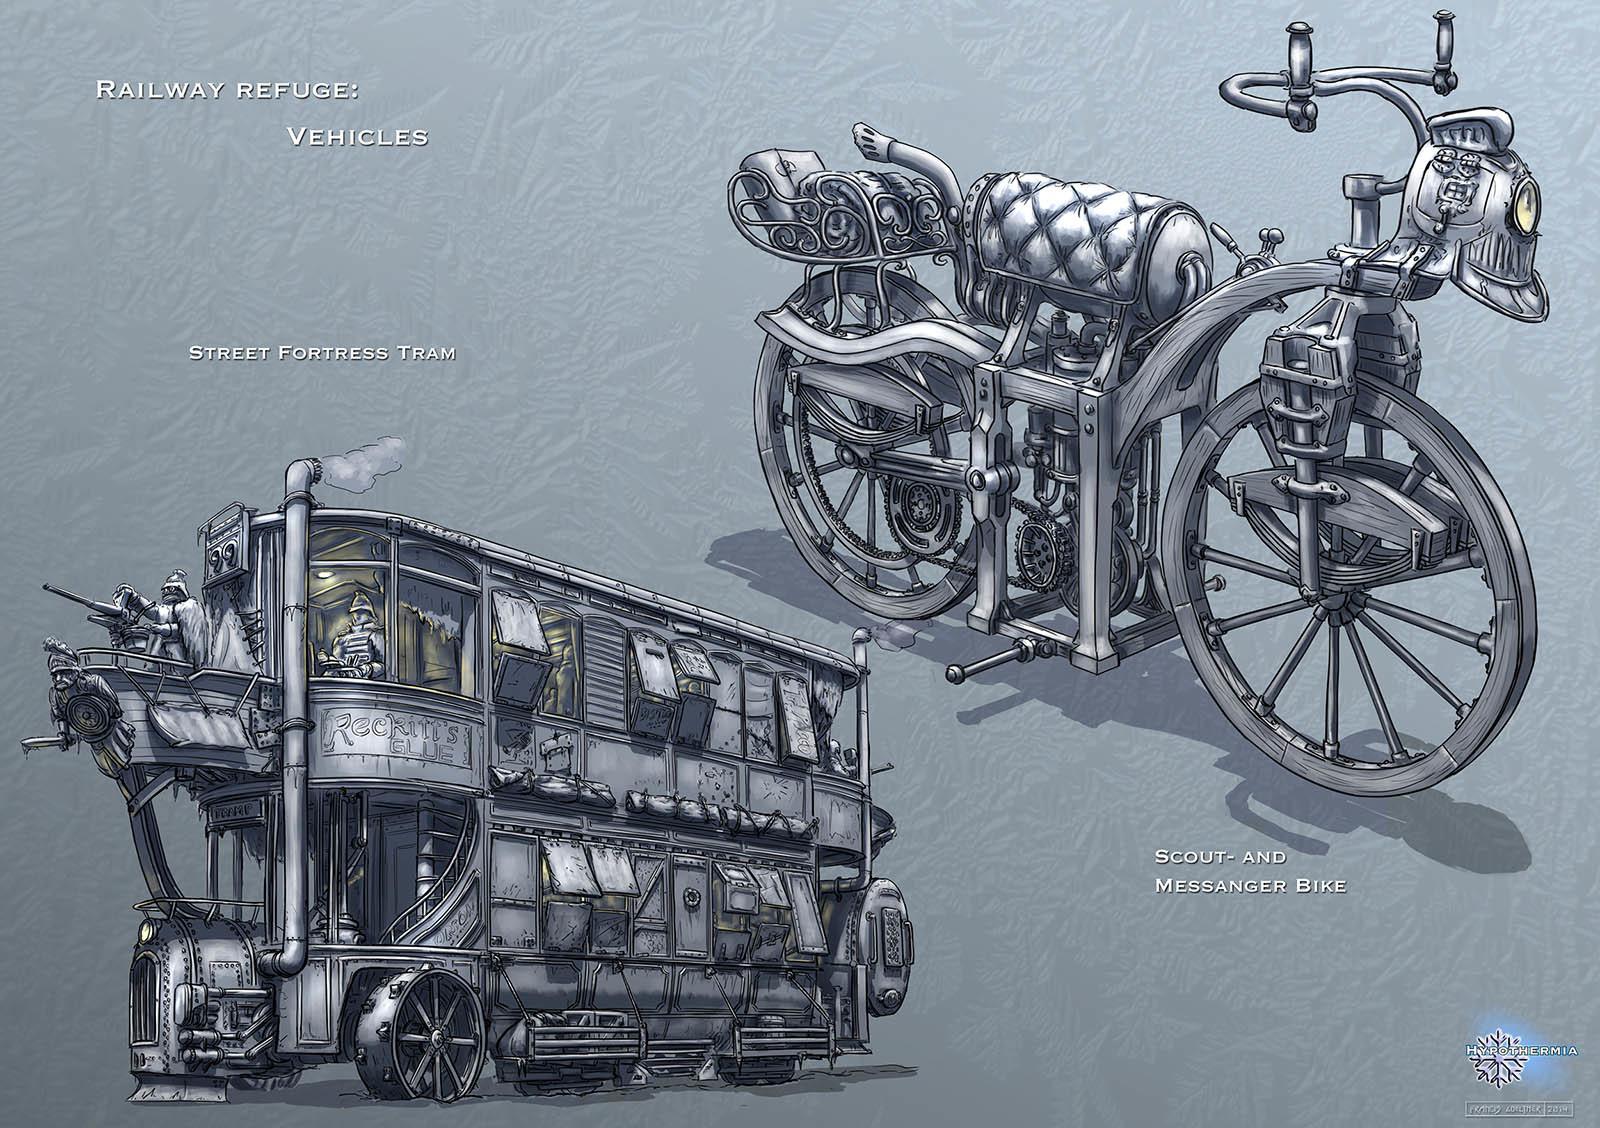 Railway Refuge – Vehicles